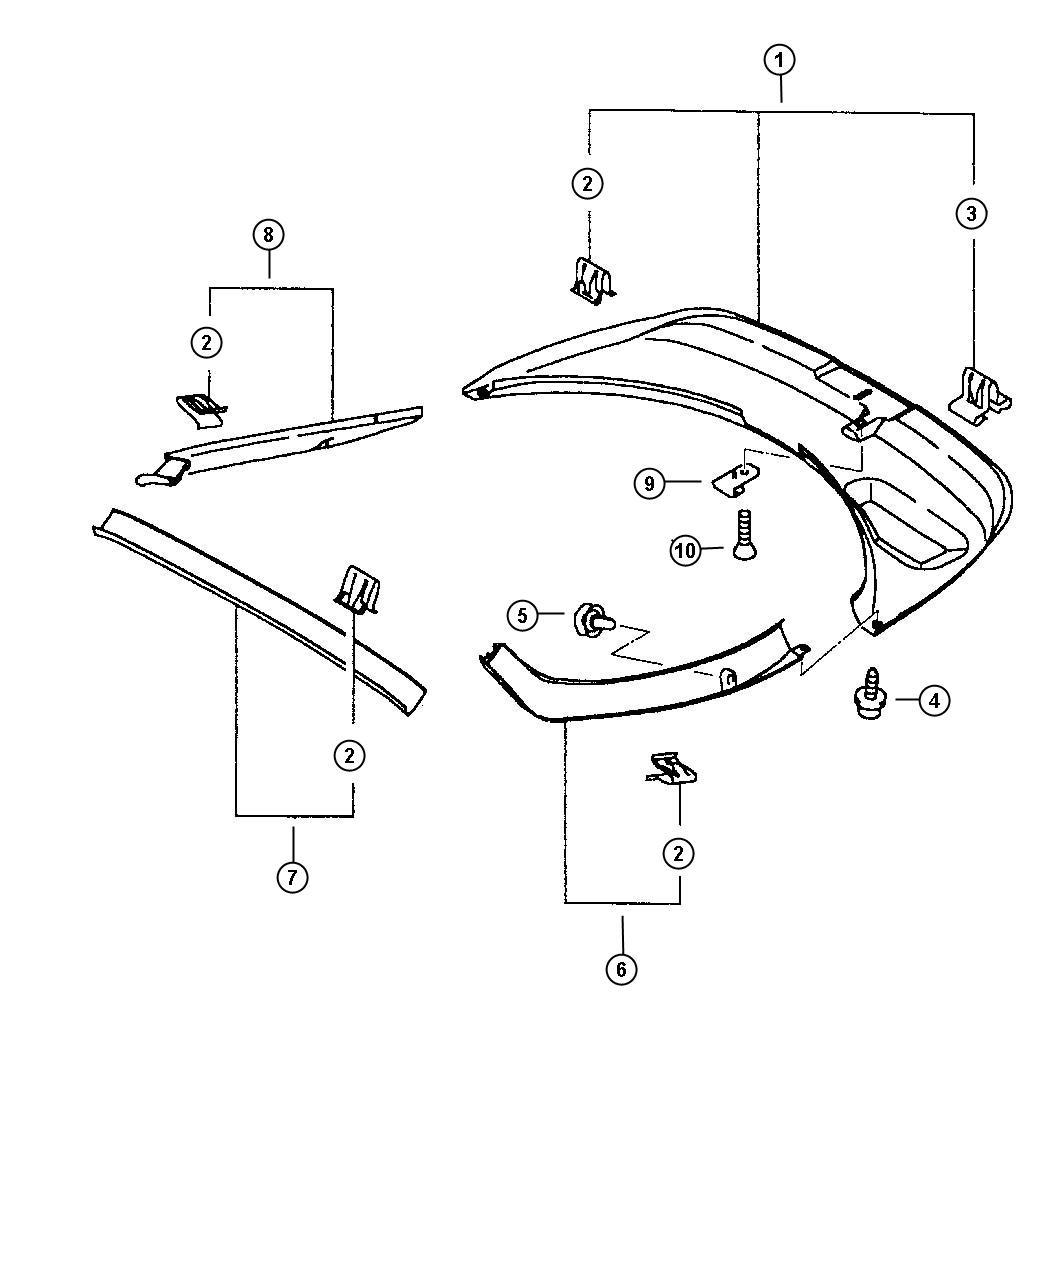 Service manual [1998 Eagle Talon Liftgate Panel Removal